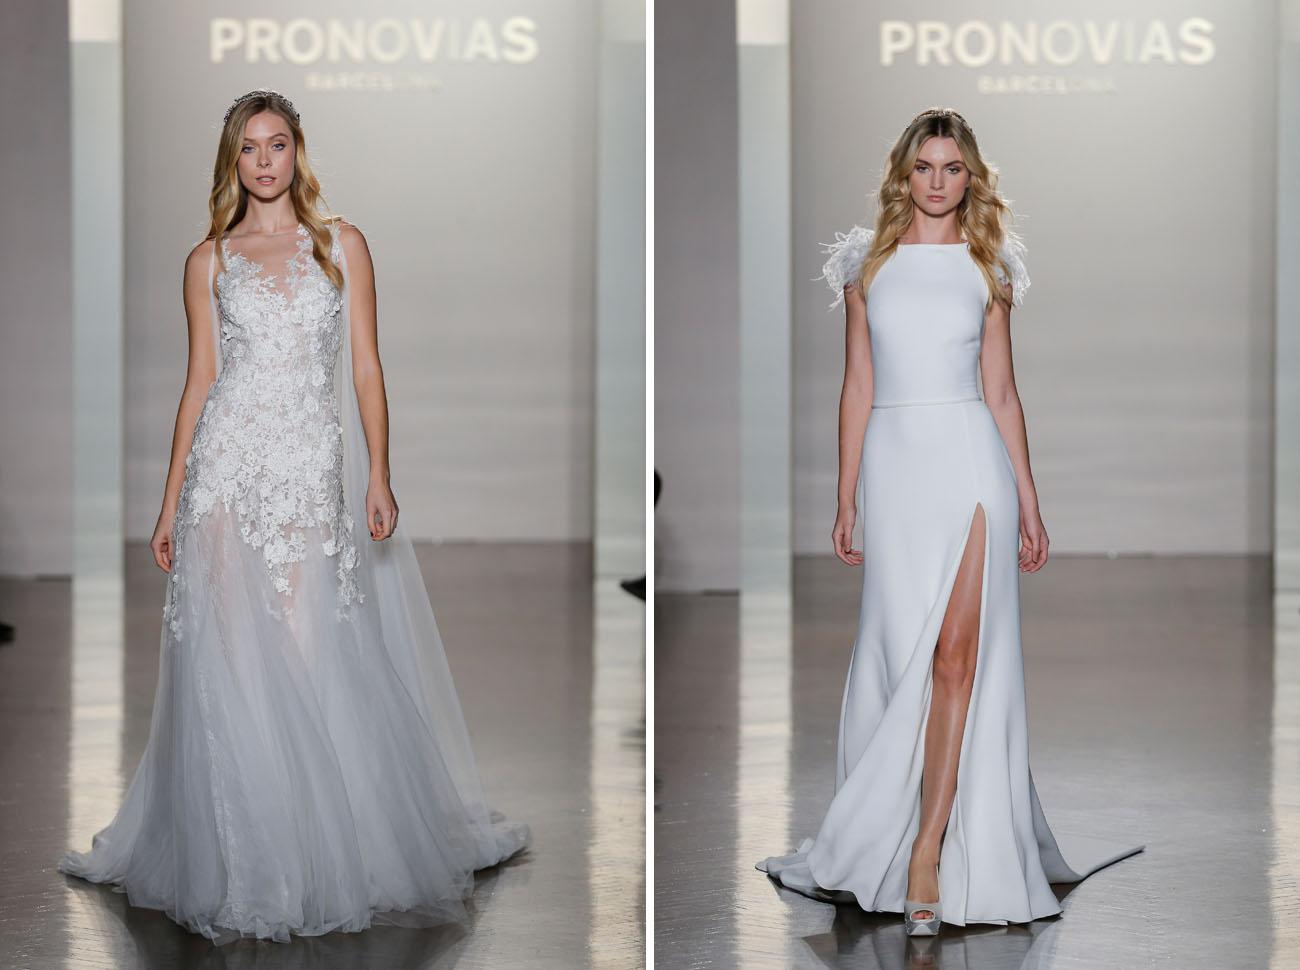 Pronovias Bridal Market NYC 2016